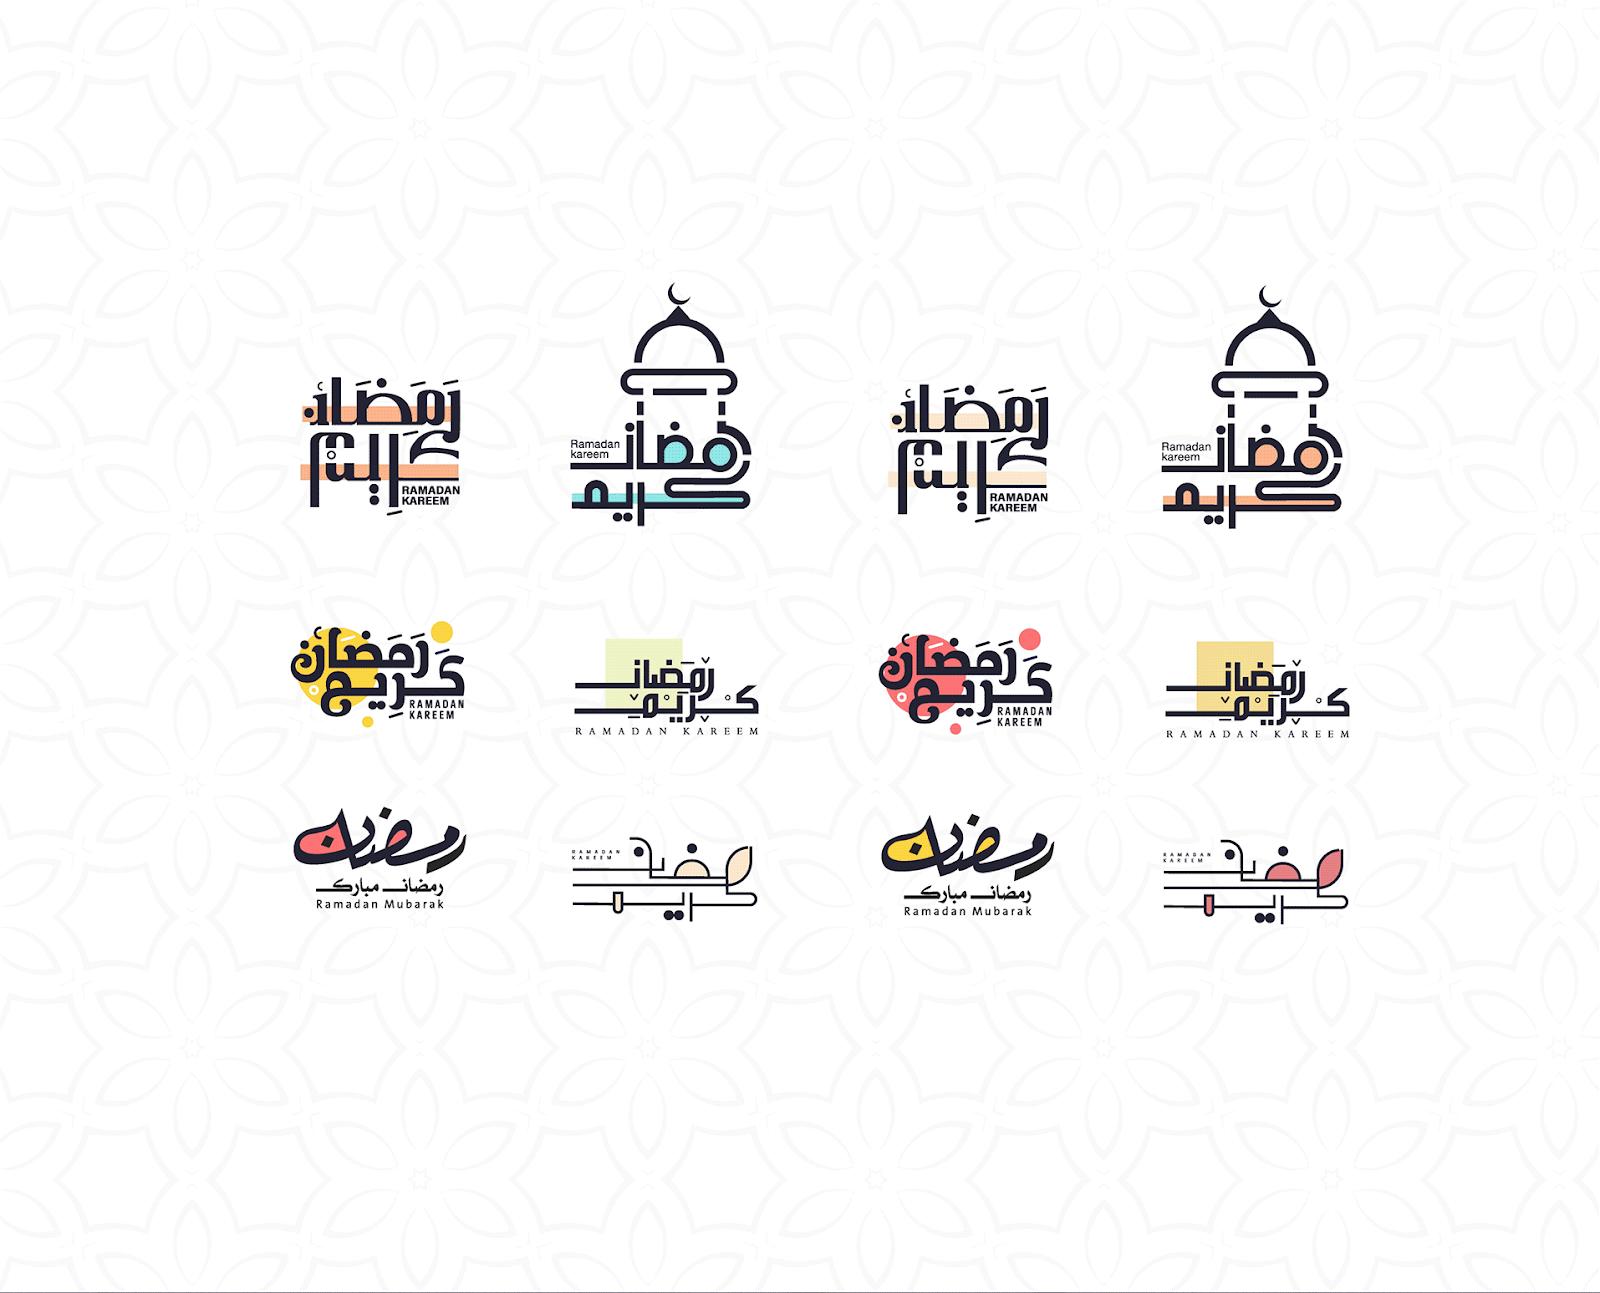 مخطوطات رمضان 2020 للتحميل مجاناً 6c9b8a95595985.5e9b1c730a9a3